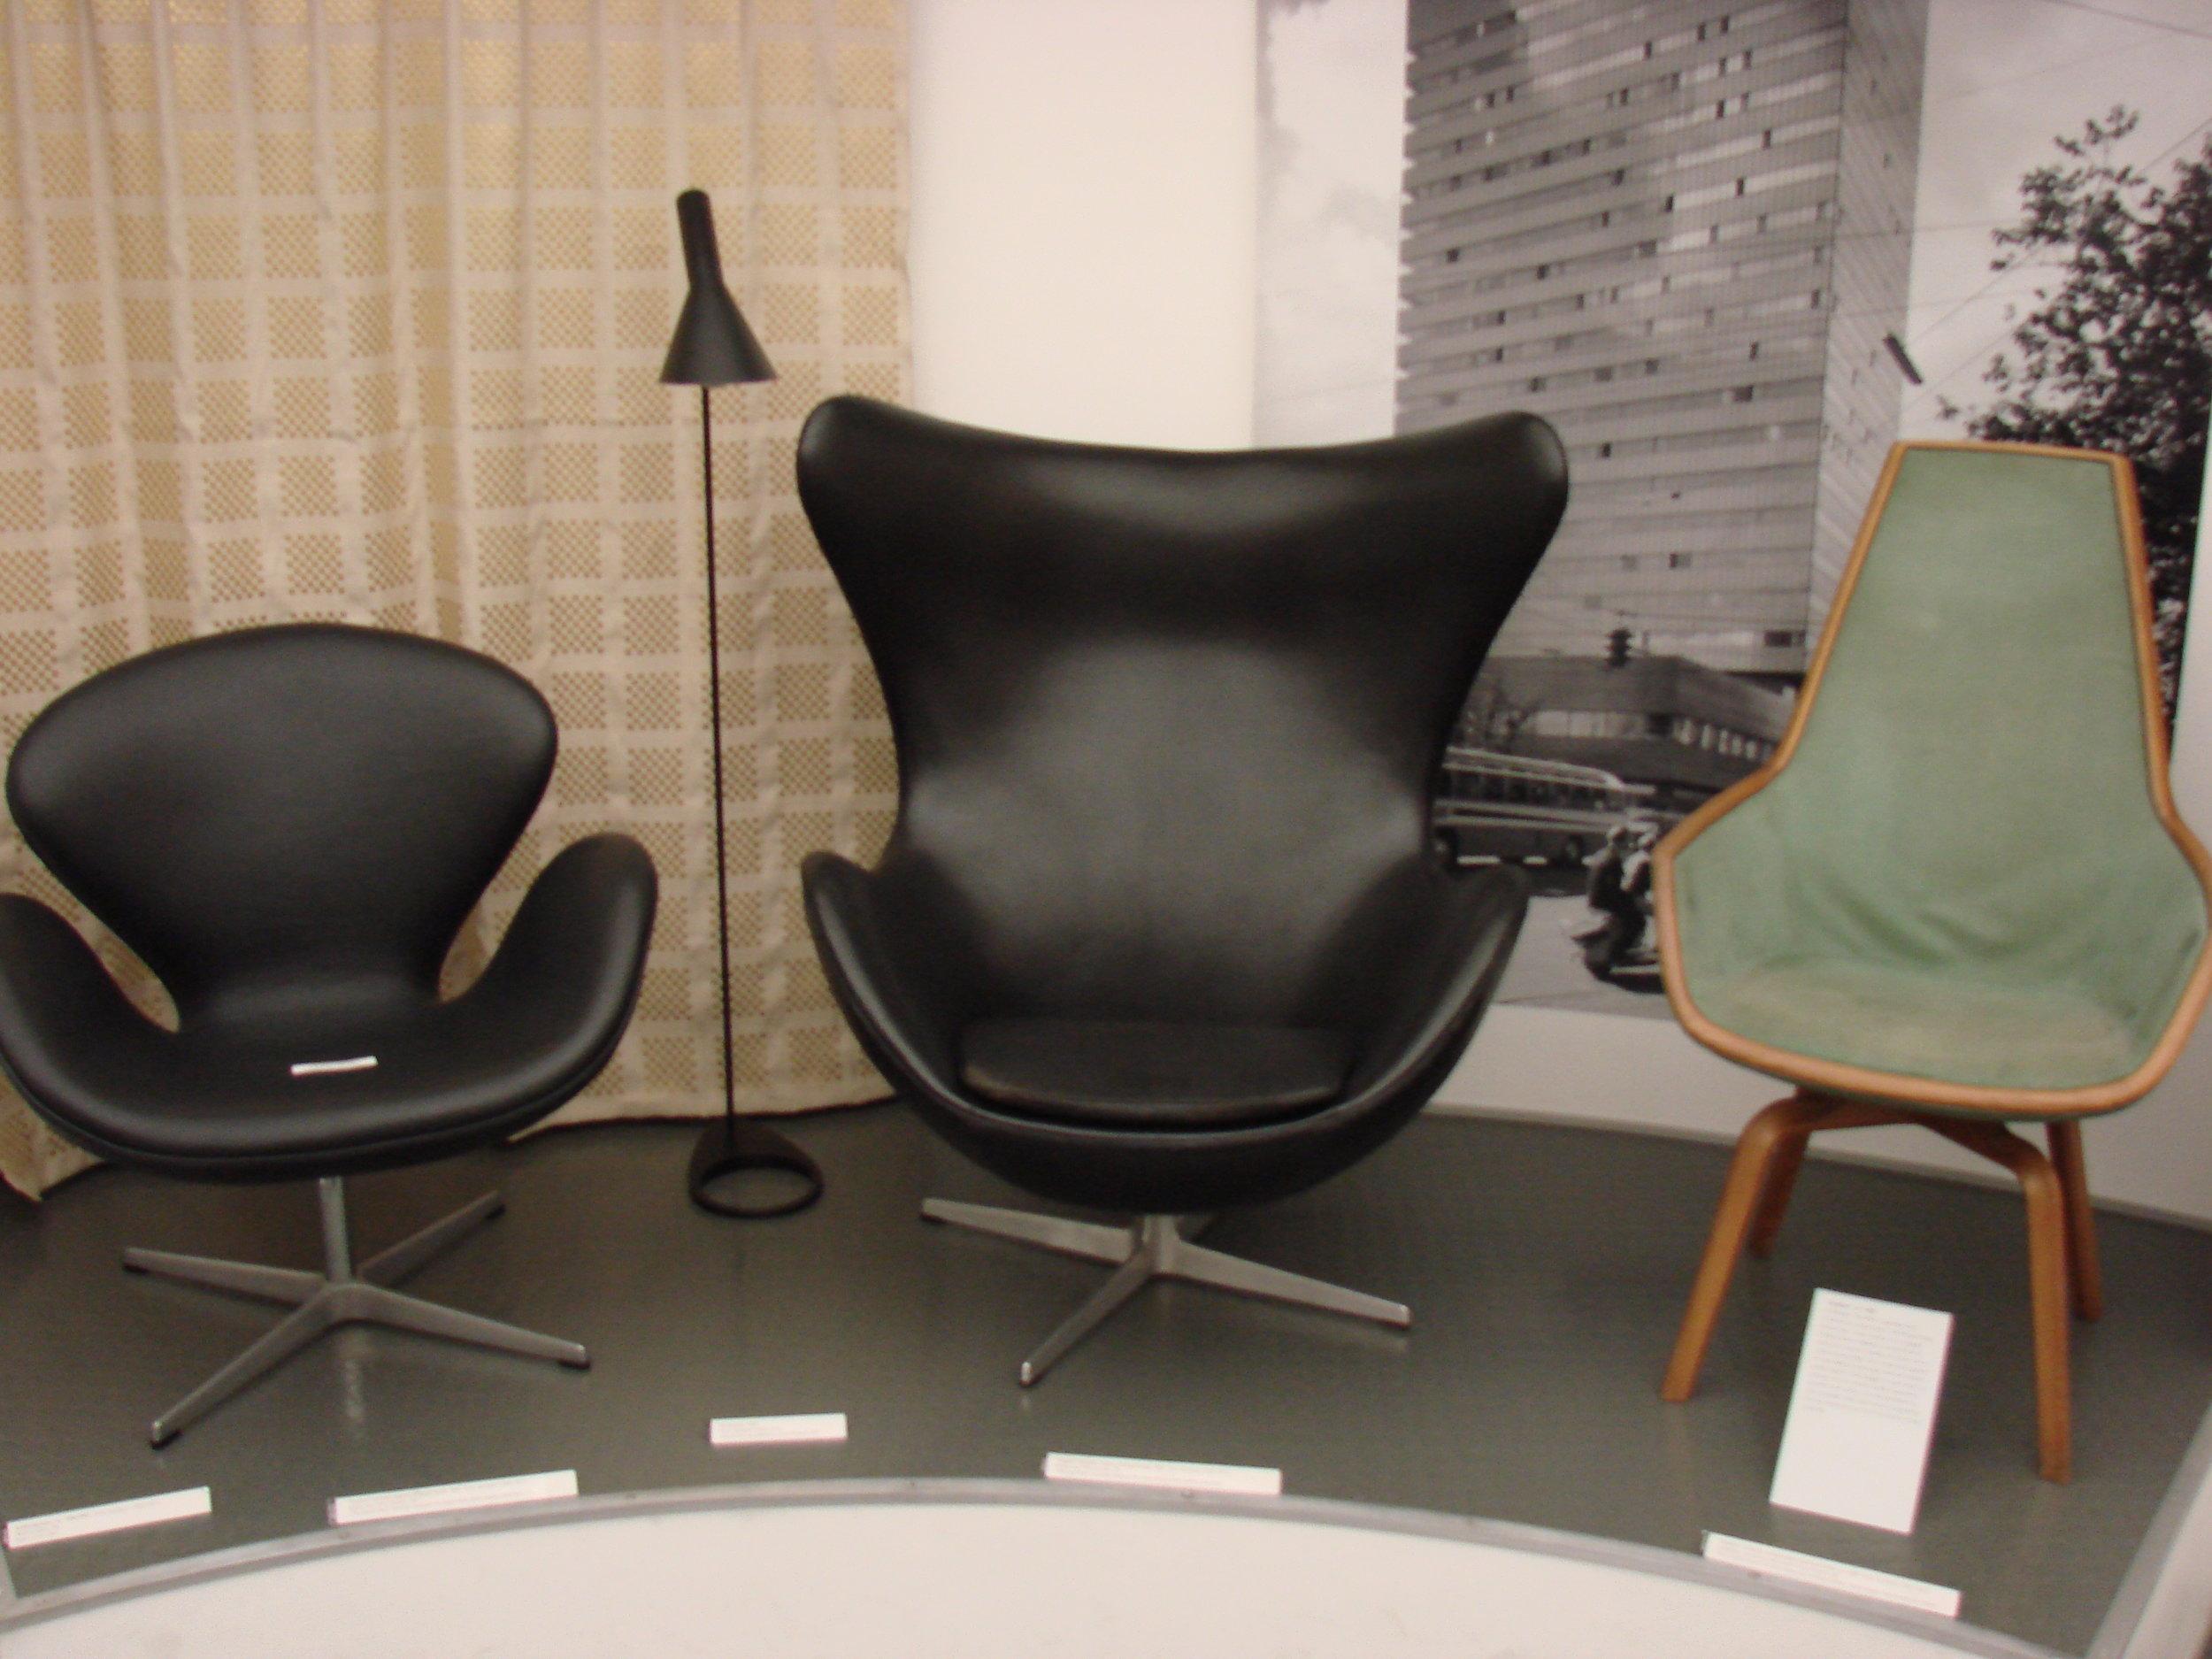 SAS_Royal_Hotel_furniture_in_Copenhagen.JPG